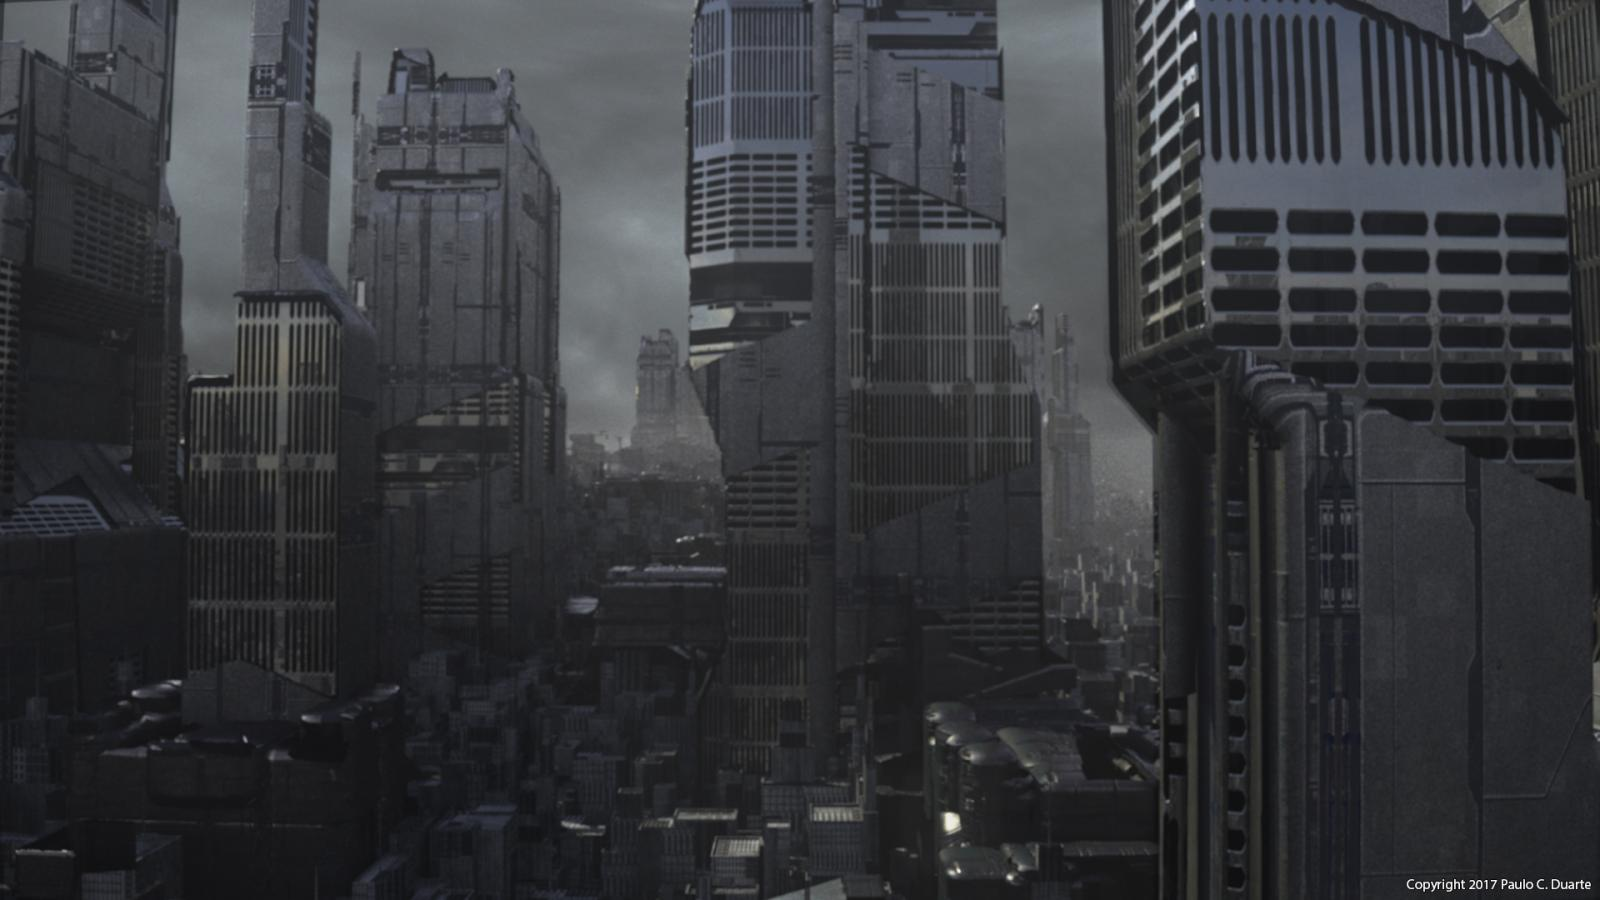 sci-fi_city_concept_003.jpg